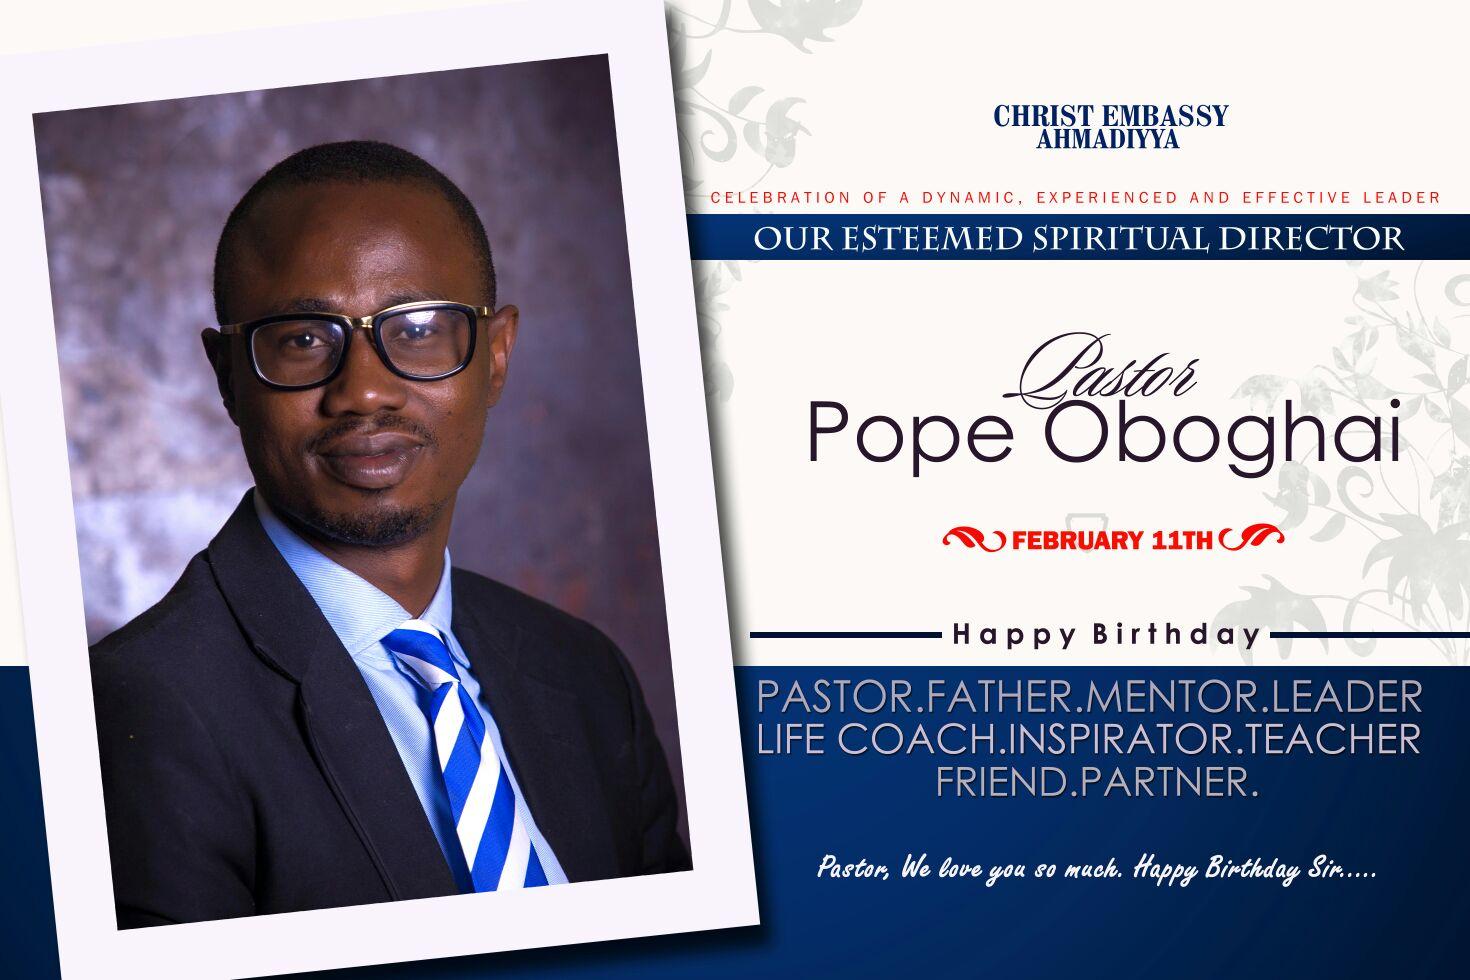 Happy birthday to you pastor.